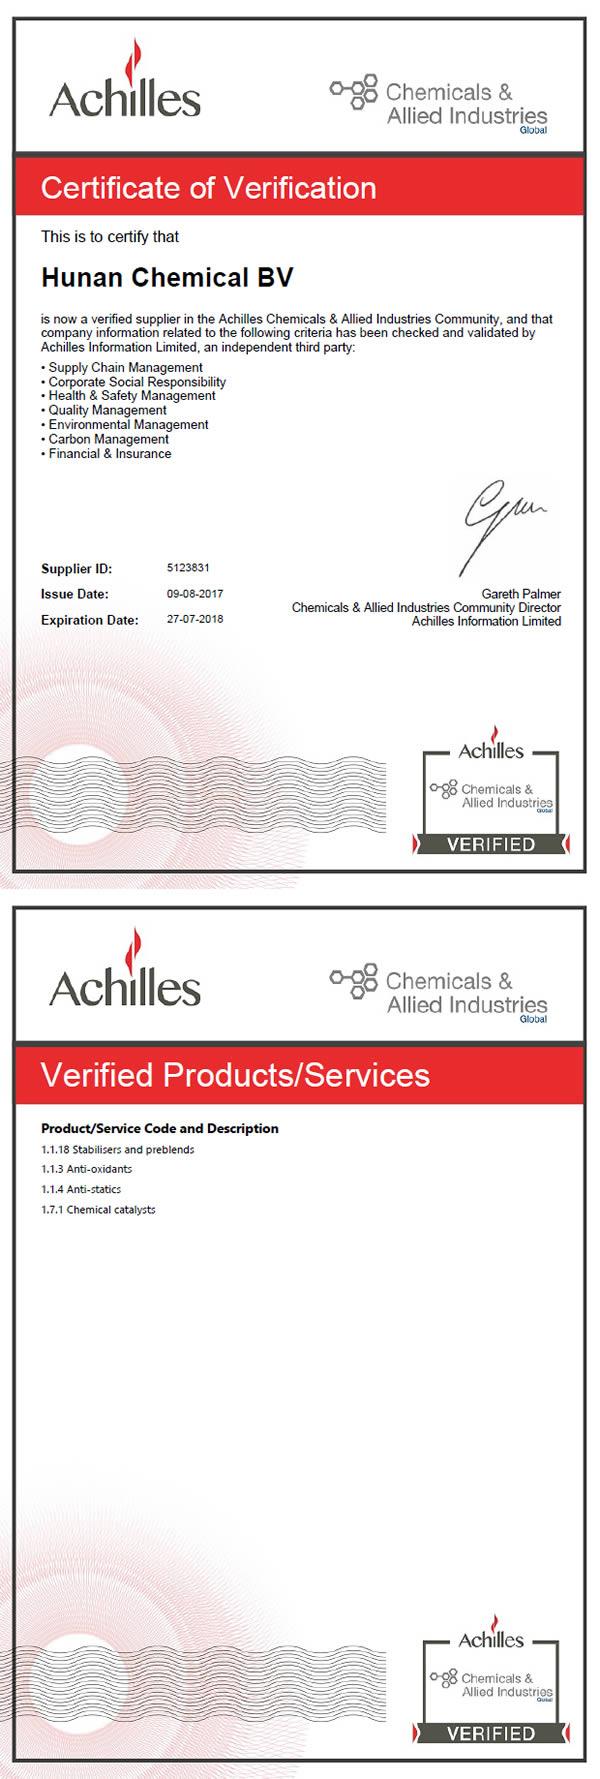 achilles certificate verification hunan chemical